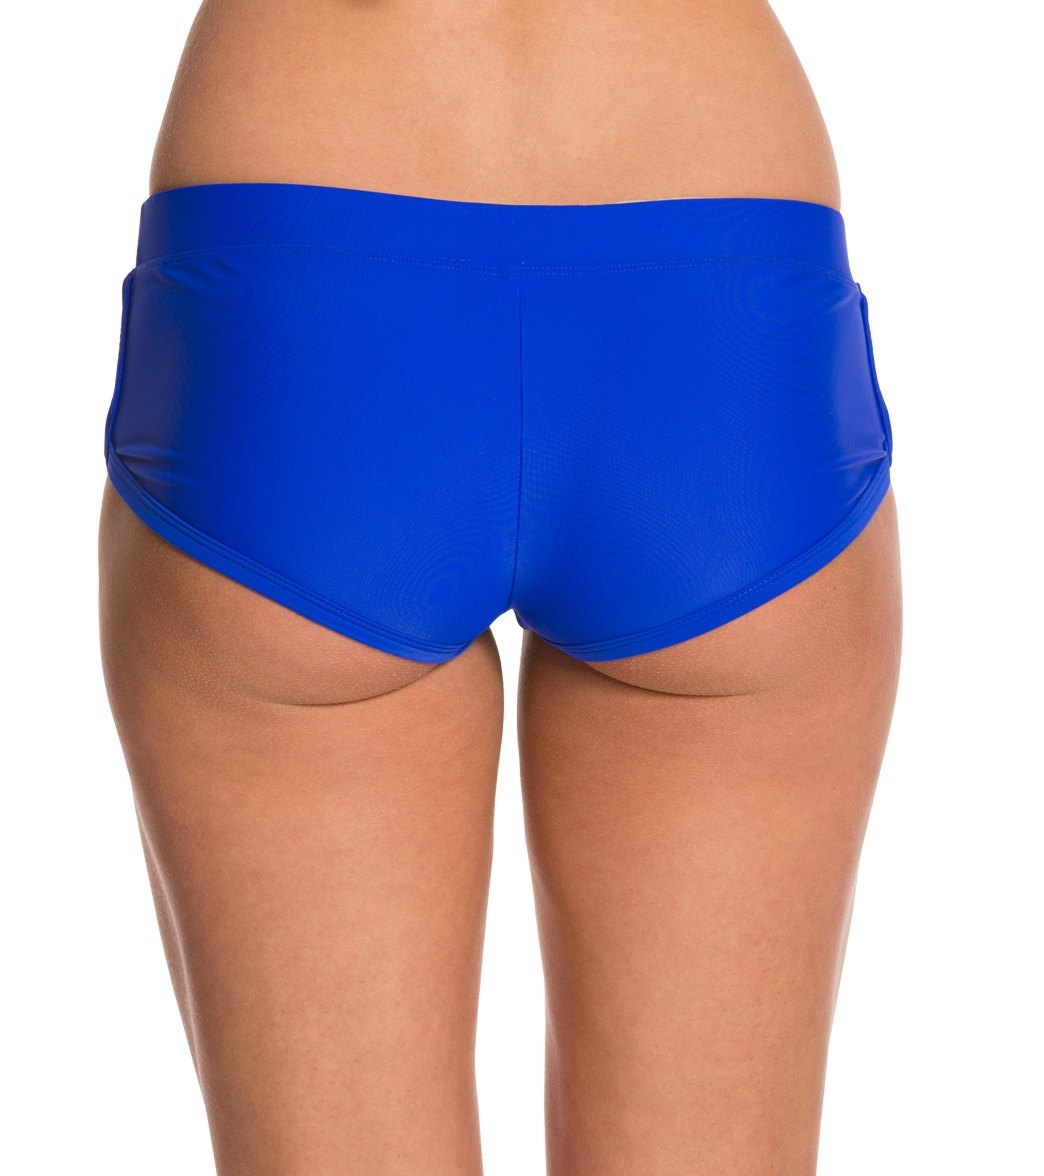 5eda5860cdae2b Body Glove Swimwear Smoothies Sidekick Sporty Boy Short Bikini Bottom